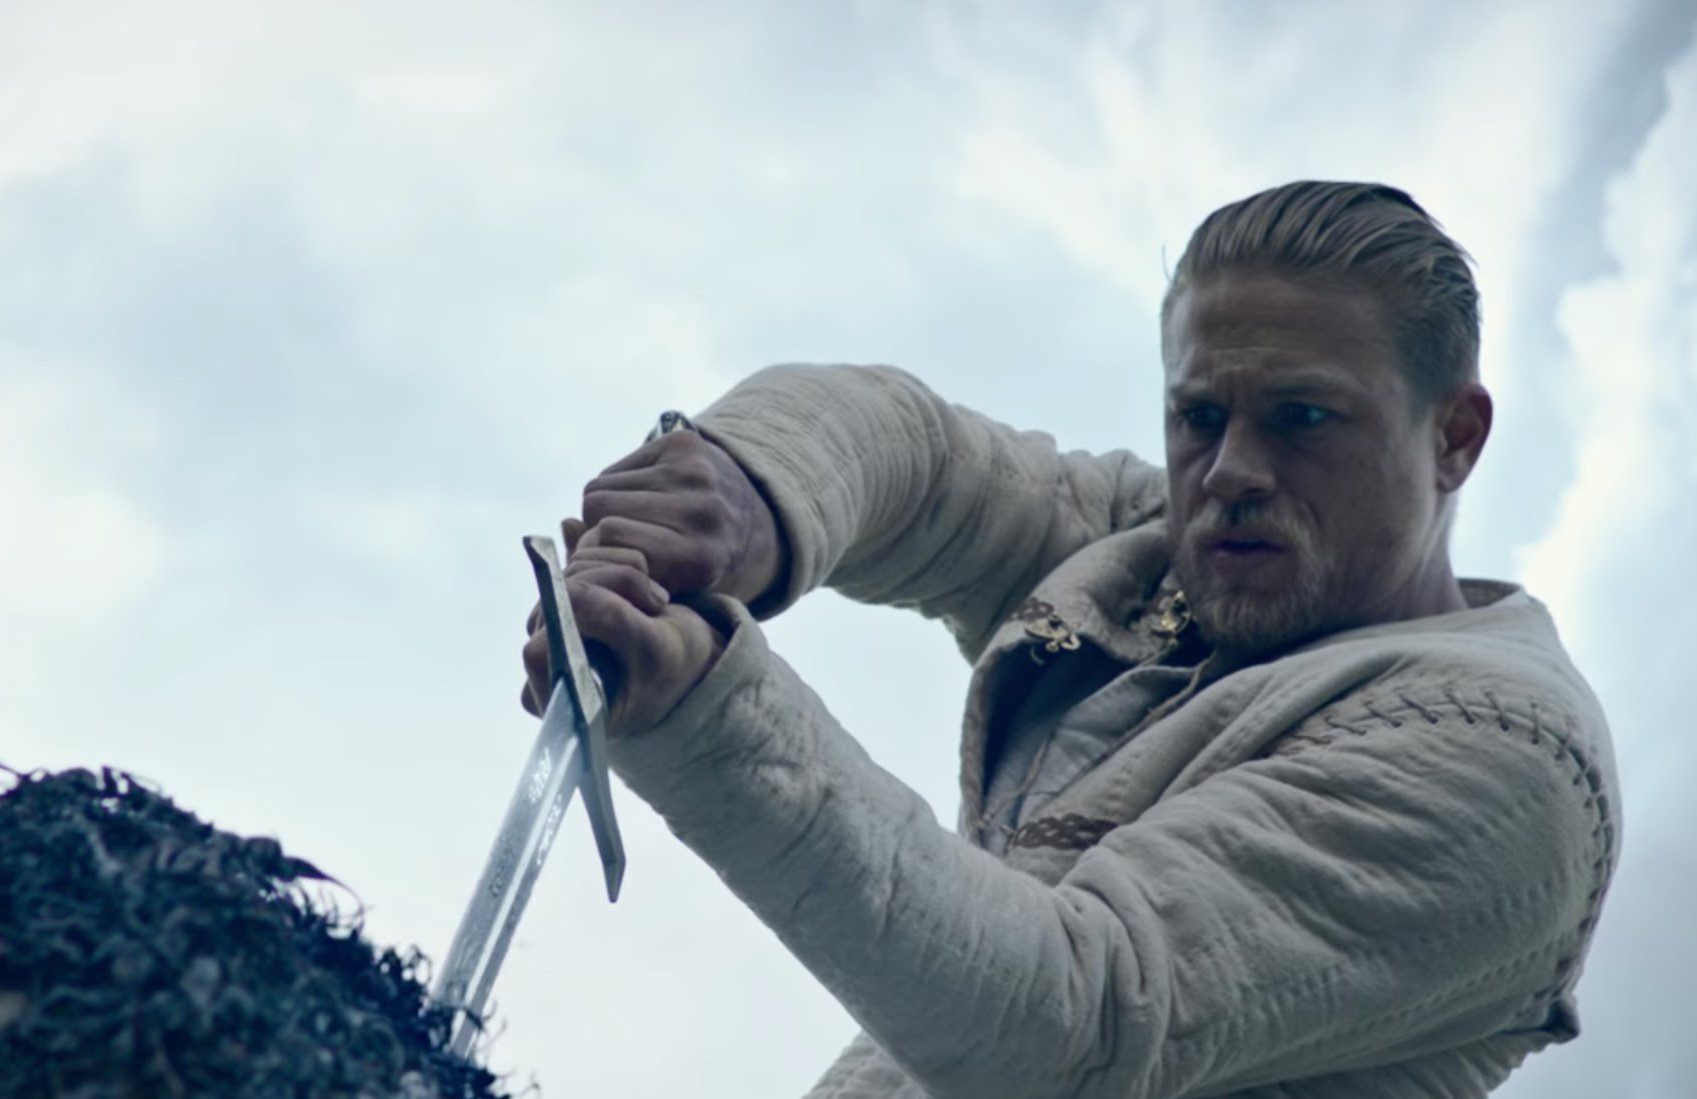 KING ARTHUR: L'ULTIMO TRAILER DELL'EPIC MOVIE FIRMATO GUY RITCHIE